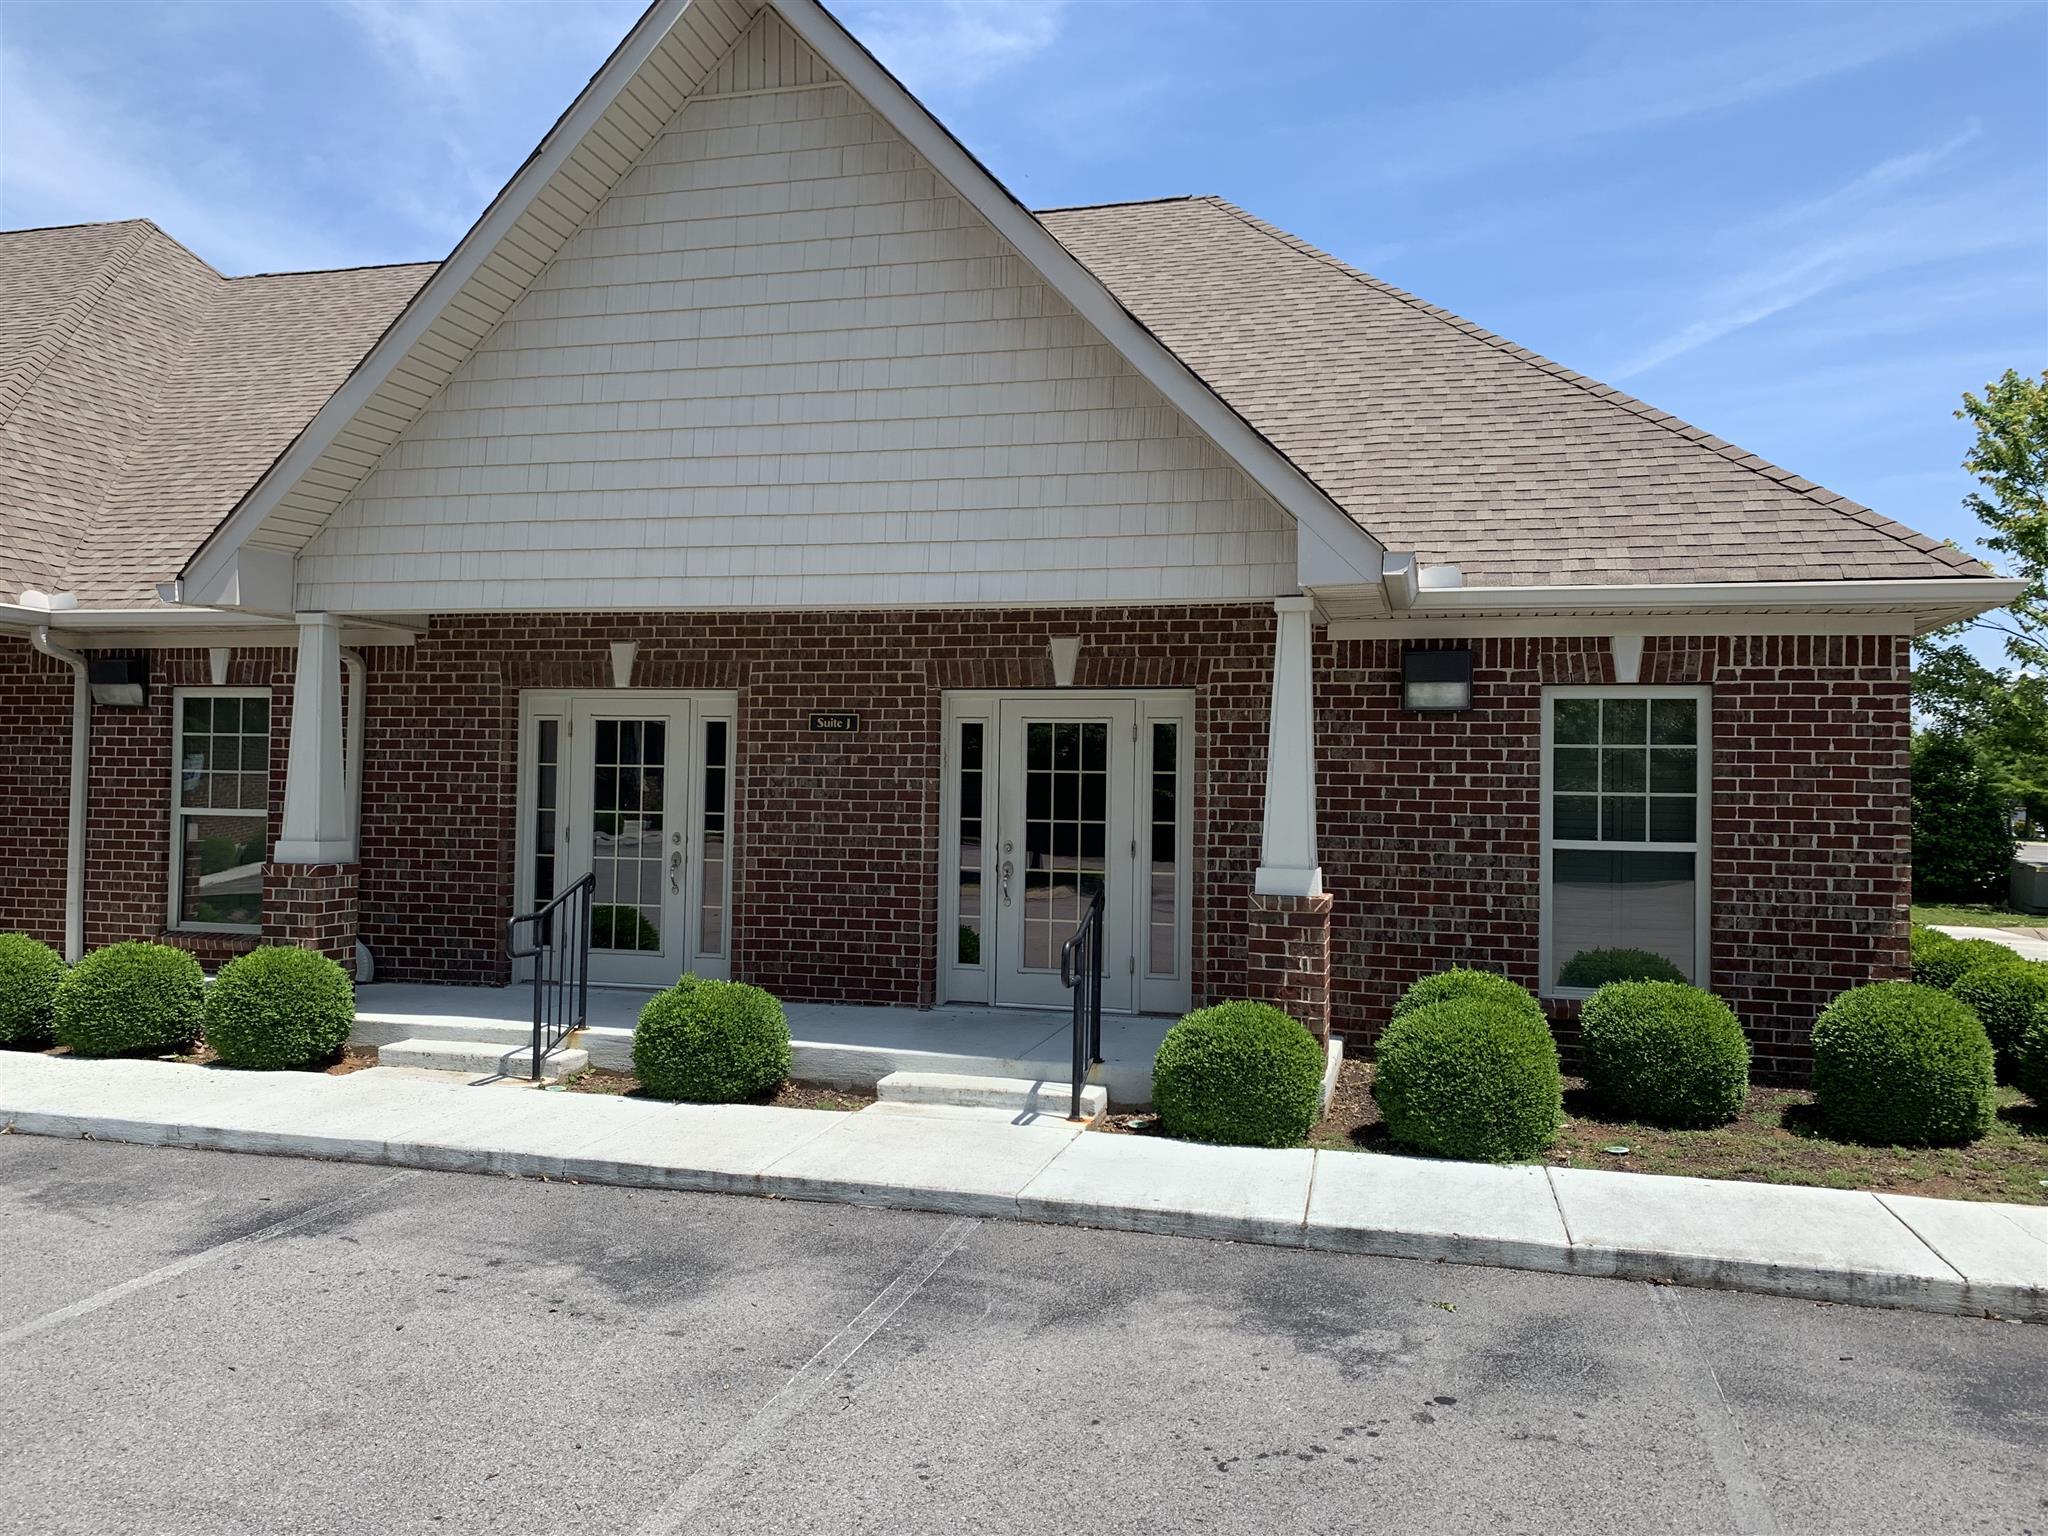 268 Veterans Pkwy, Murfreesboro, TN 37128 - Murfreesboro, TN real estate listing